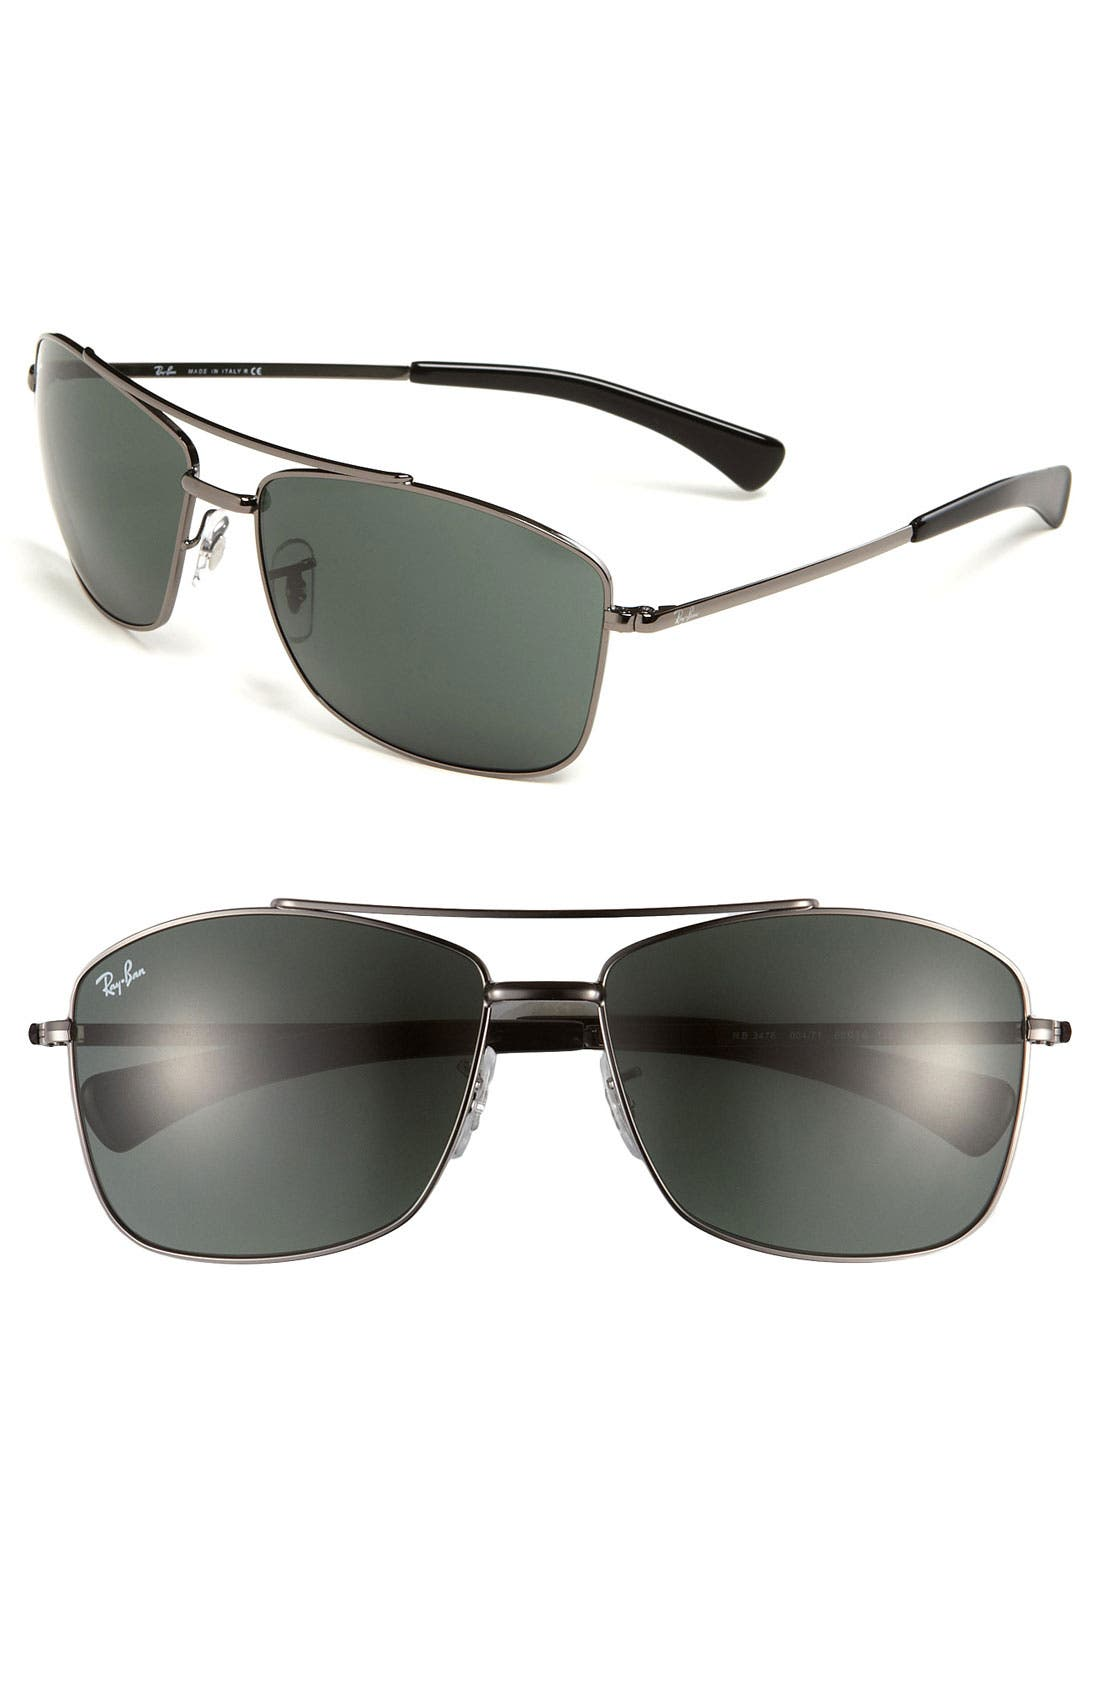 Main Image - Ray-Ban 60mm Aviator Sunglasses